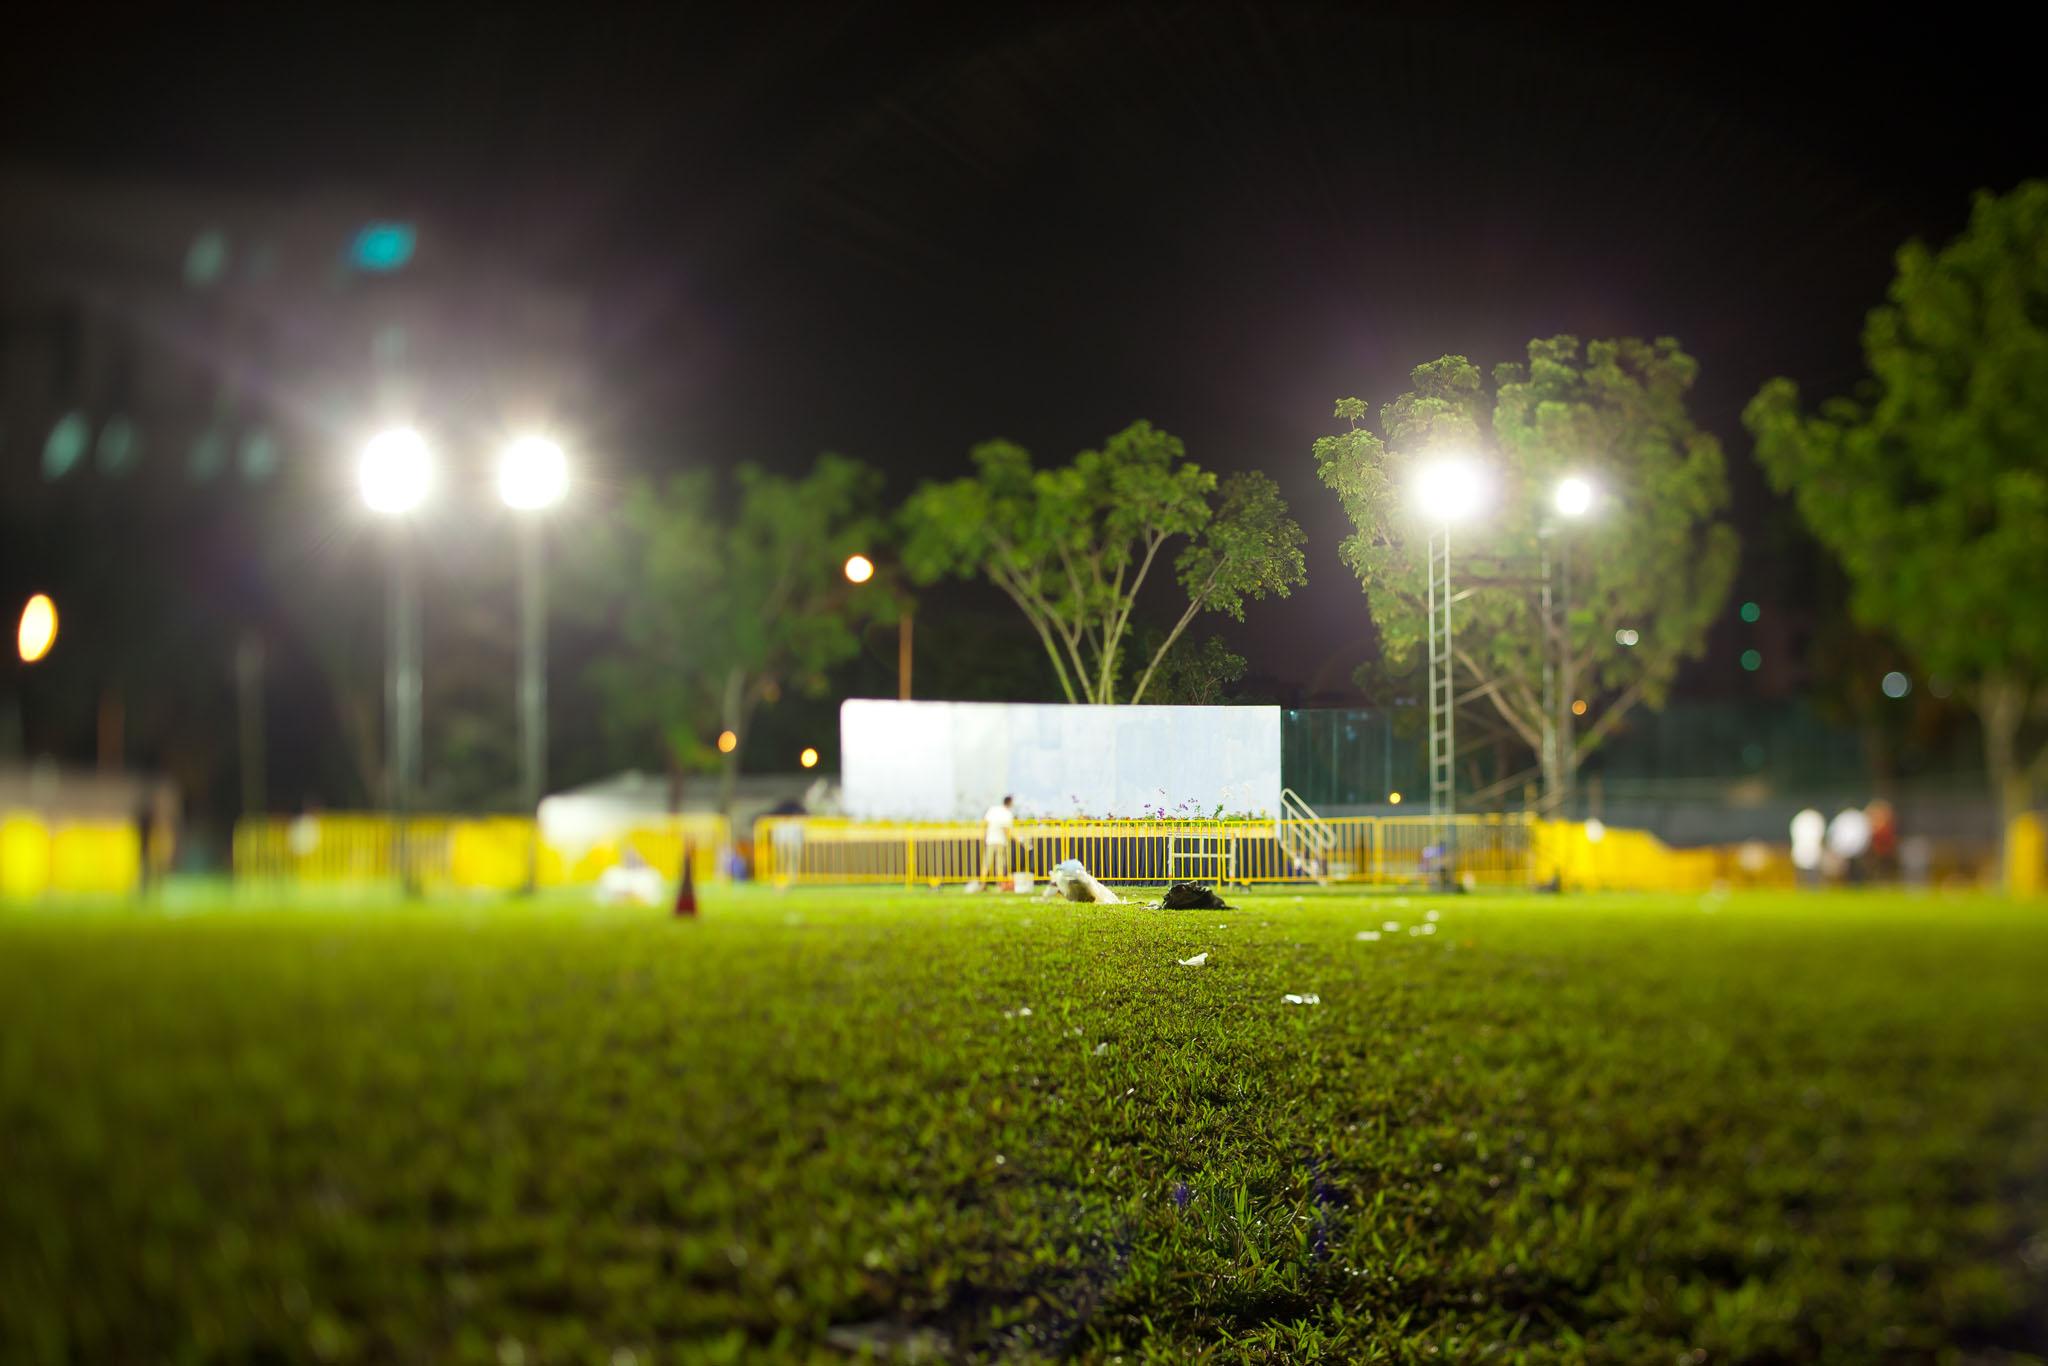 singapore-commercial-photographer-editorial-documentary-tiltshift-singaplural-zakaria-zainal-14.jpg